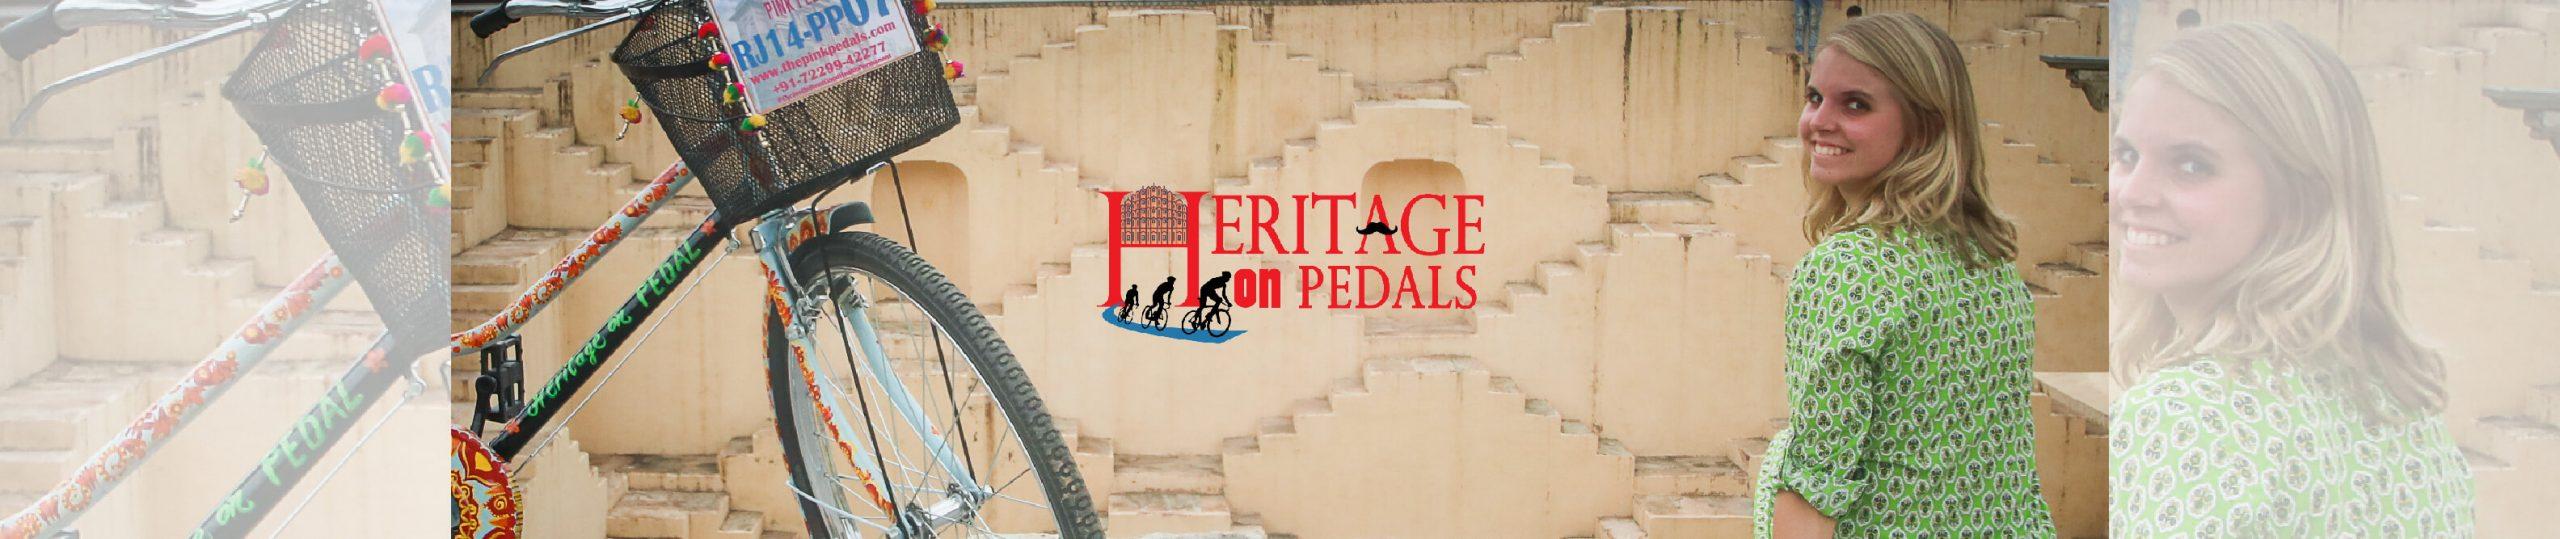 Pink_Pedals Jaipur 01